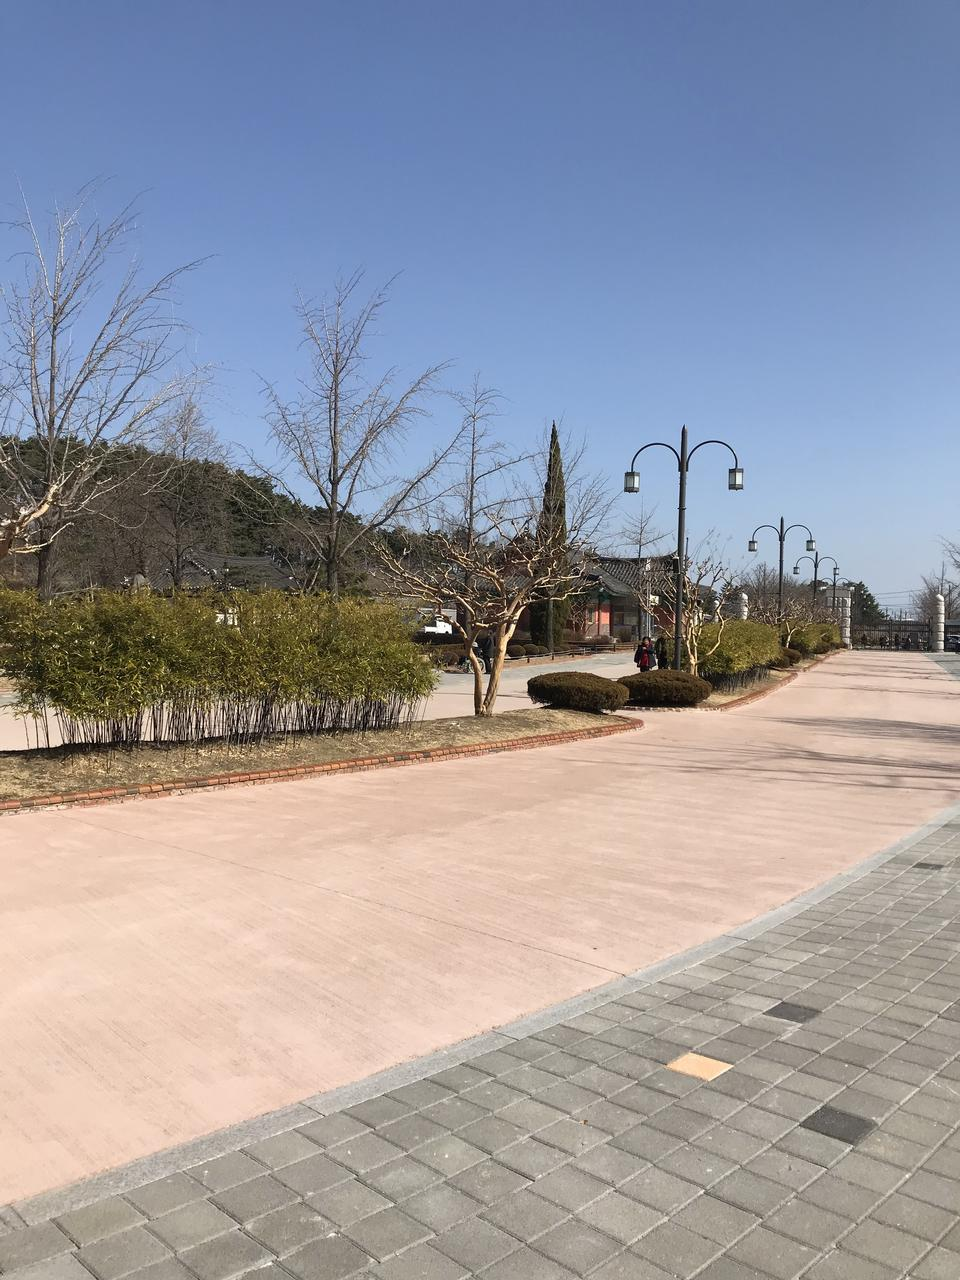 Ojukheon in Gangneung, Gangwon Korea